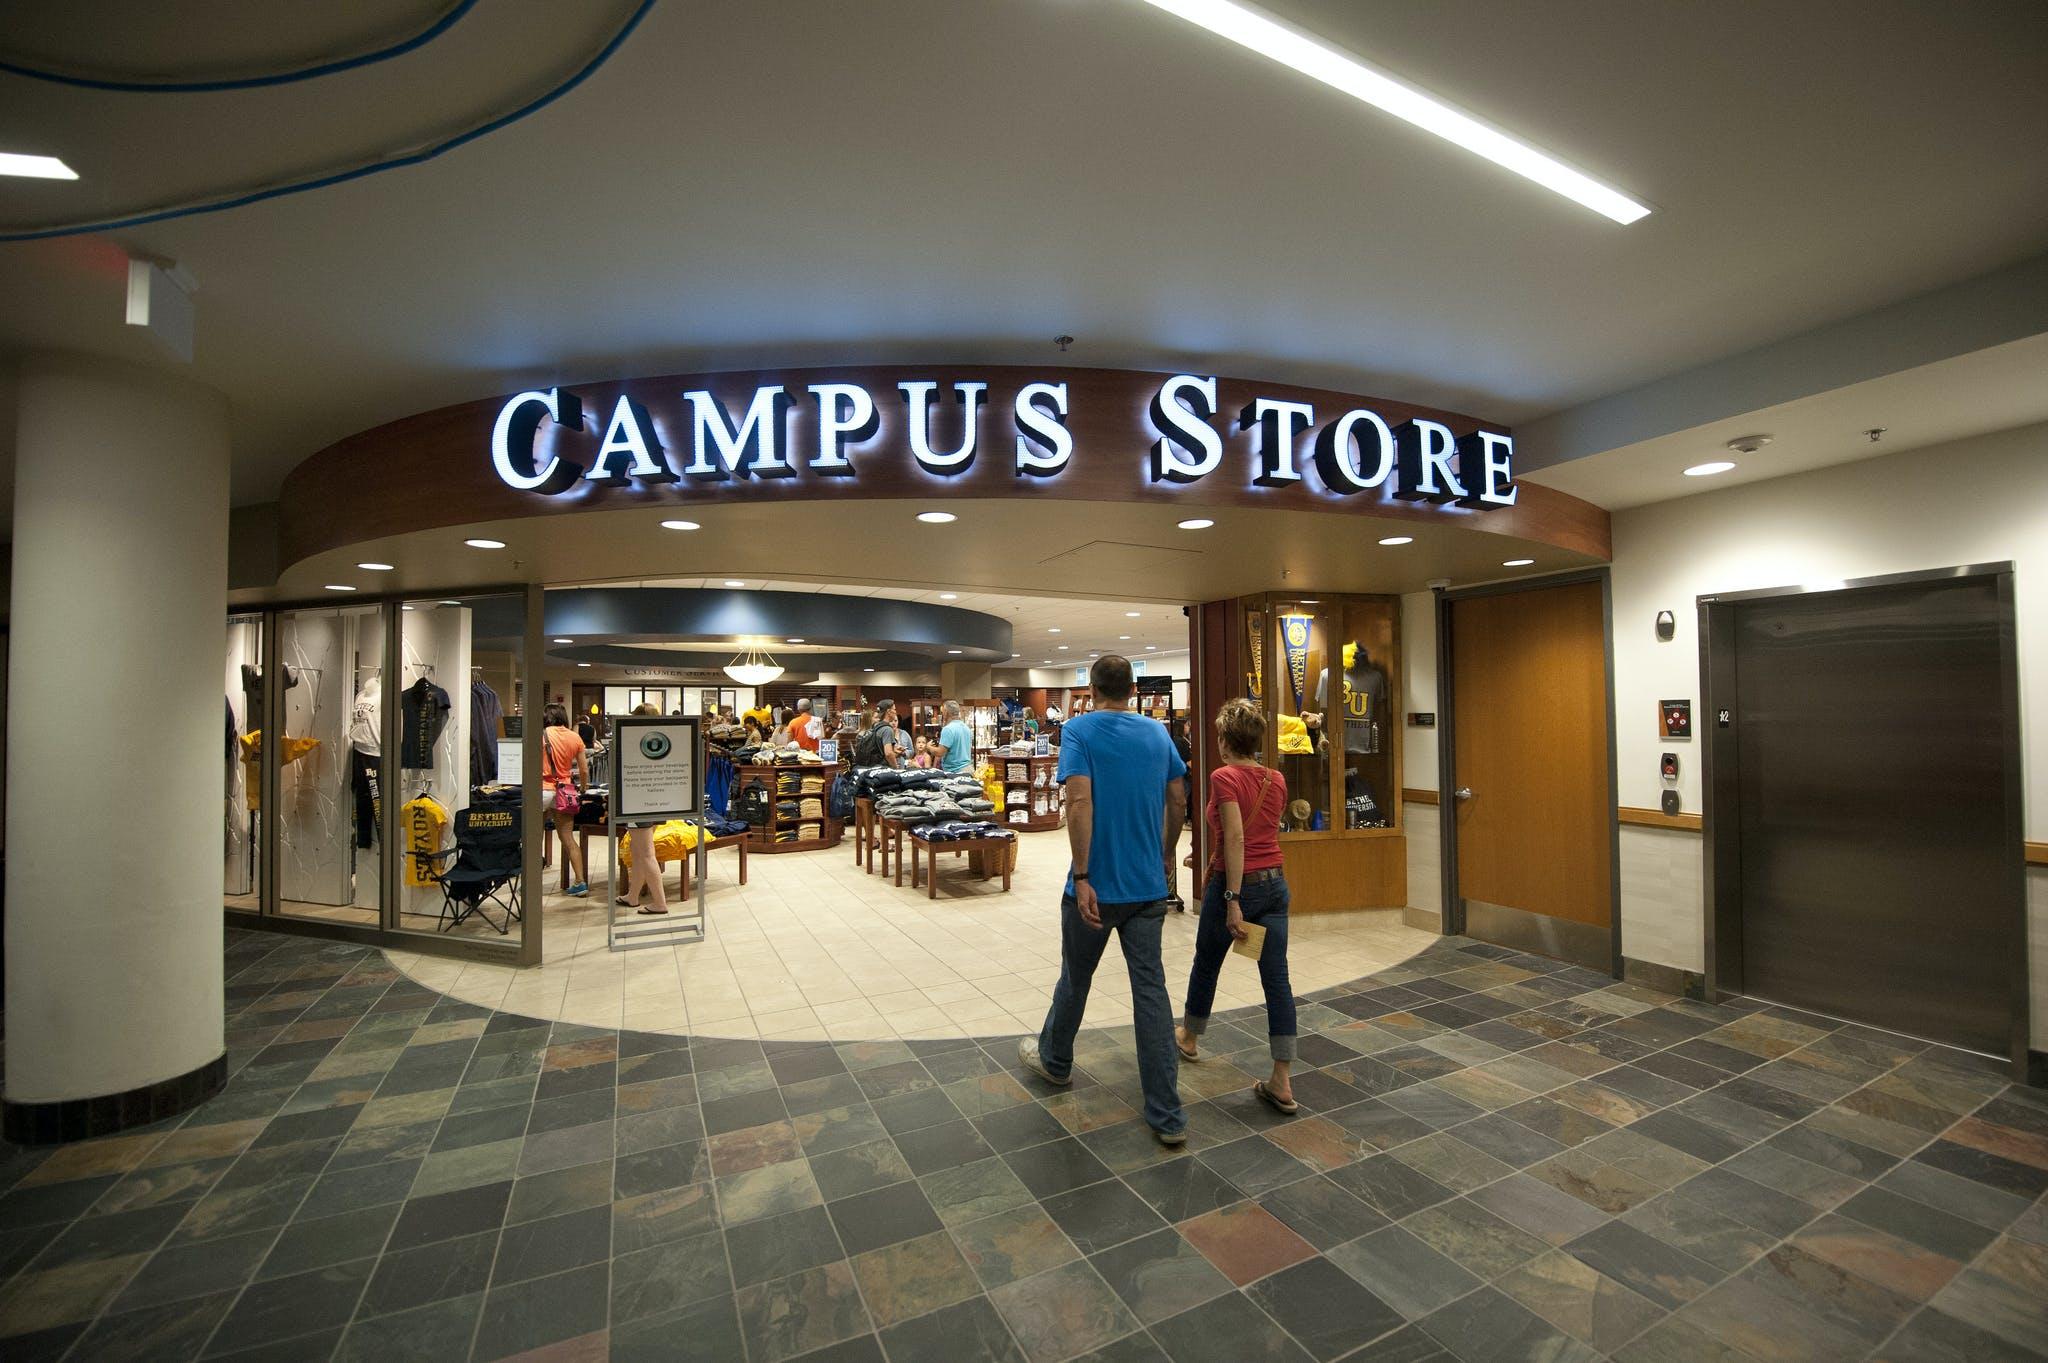 Bethel's Campus Store